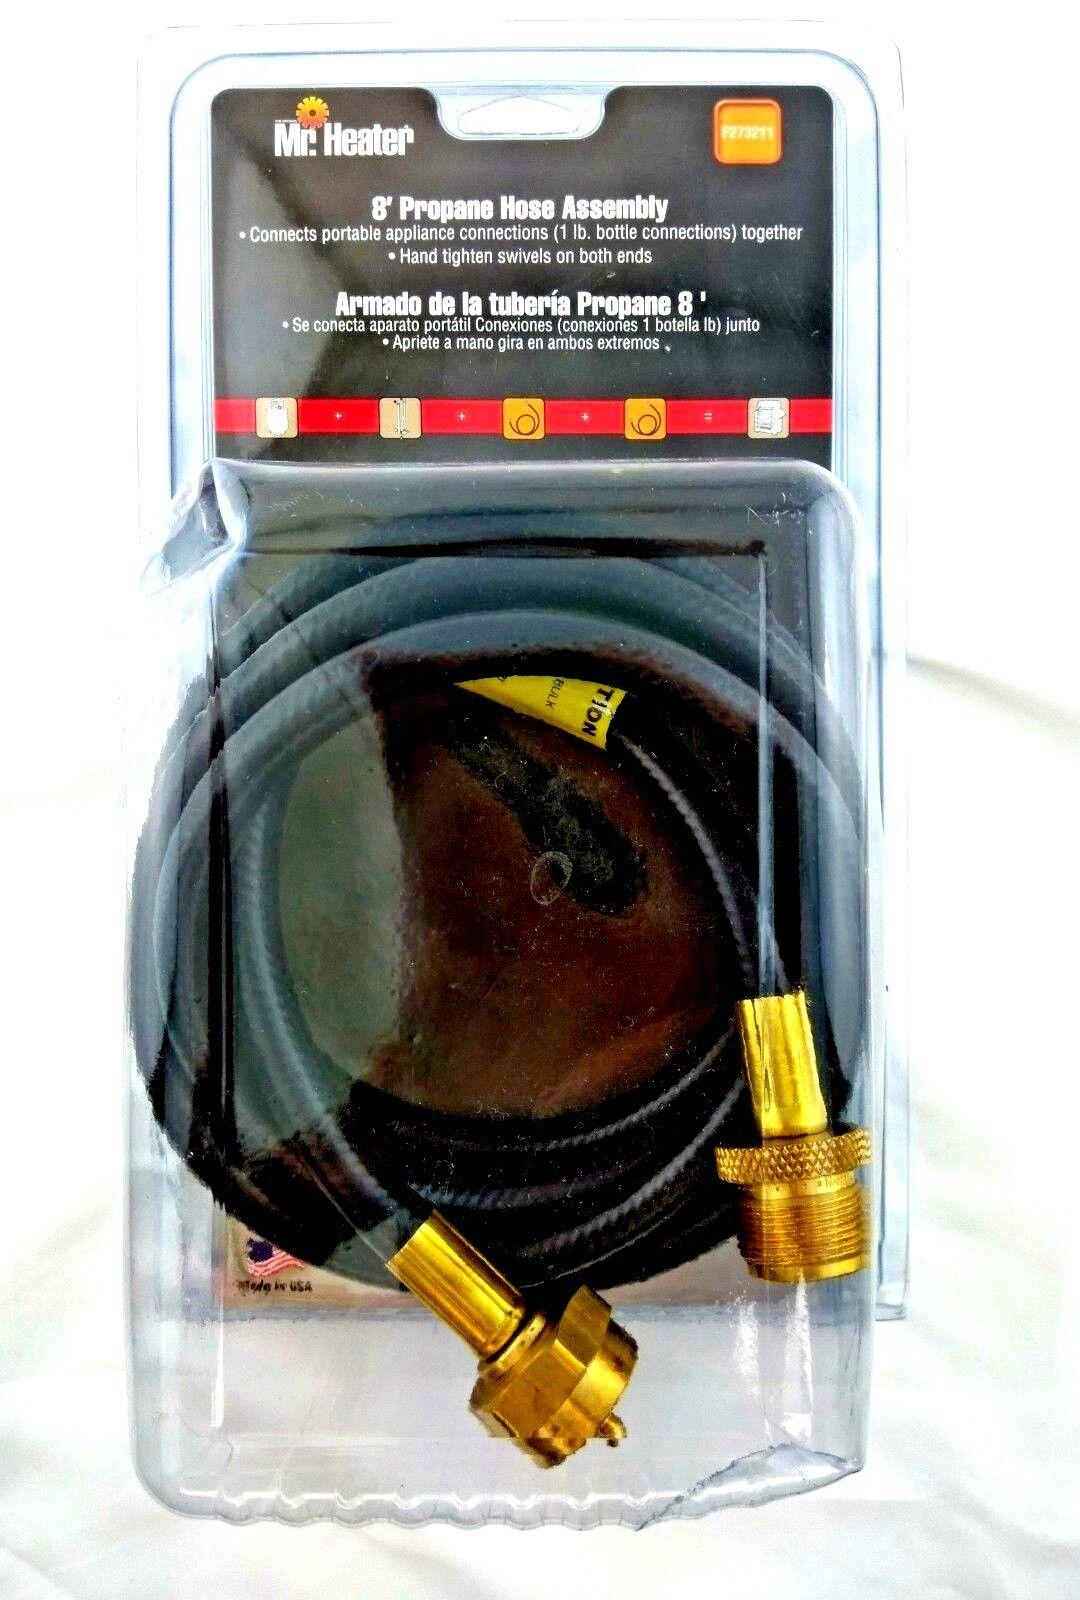 Mr Heater 8 Propane Hose Assembly F273211 Ebay Big Buddy Wiring Diagram Stock Photo